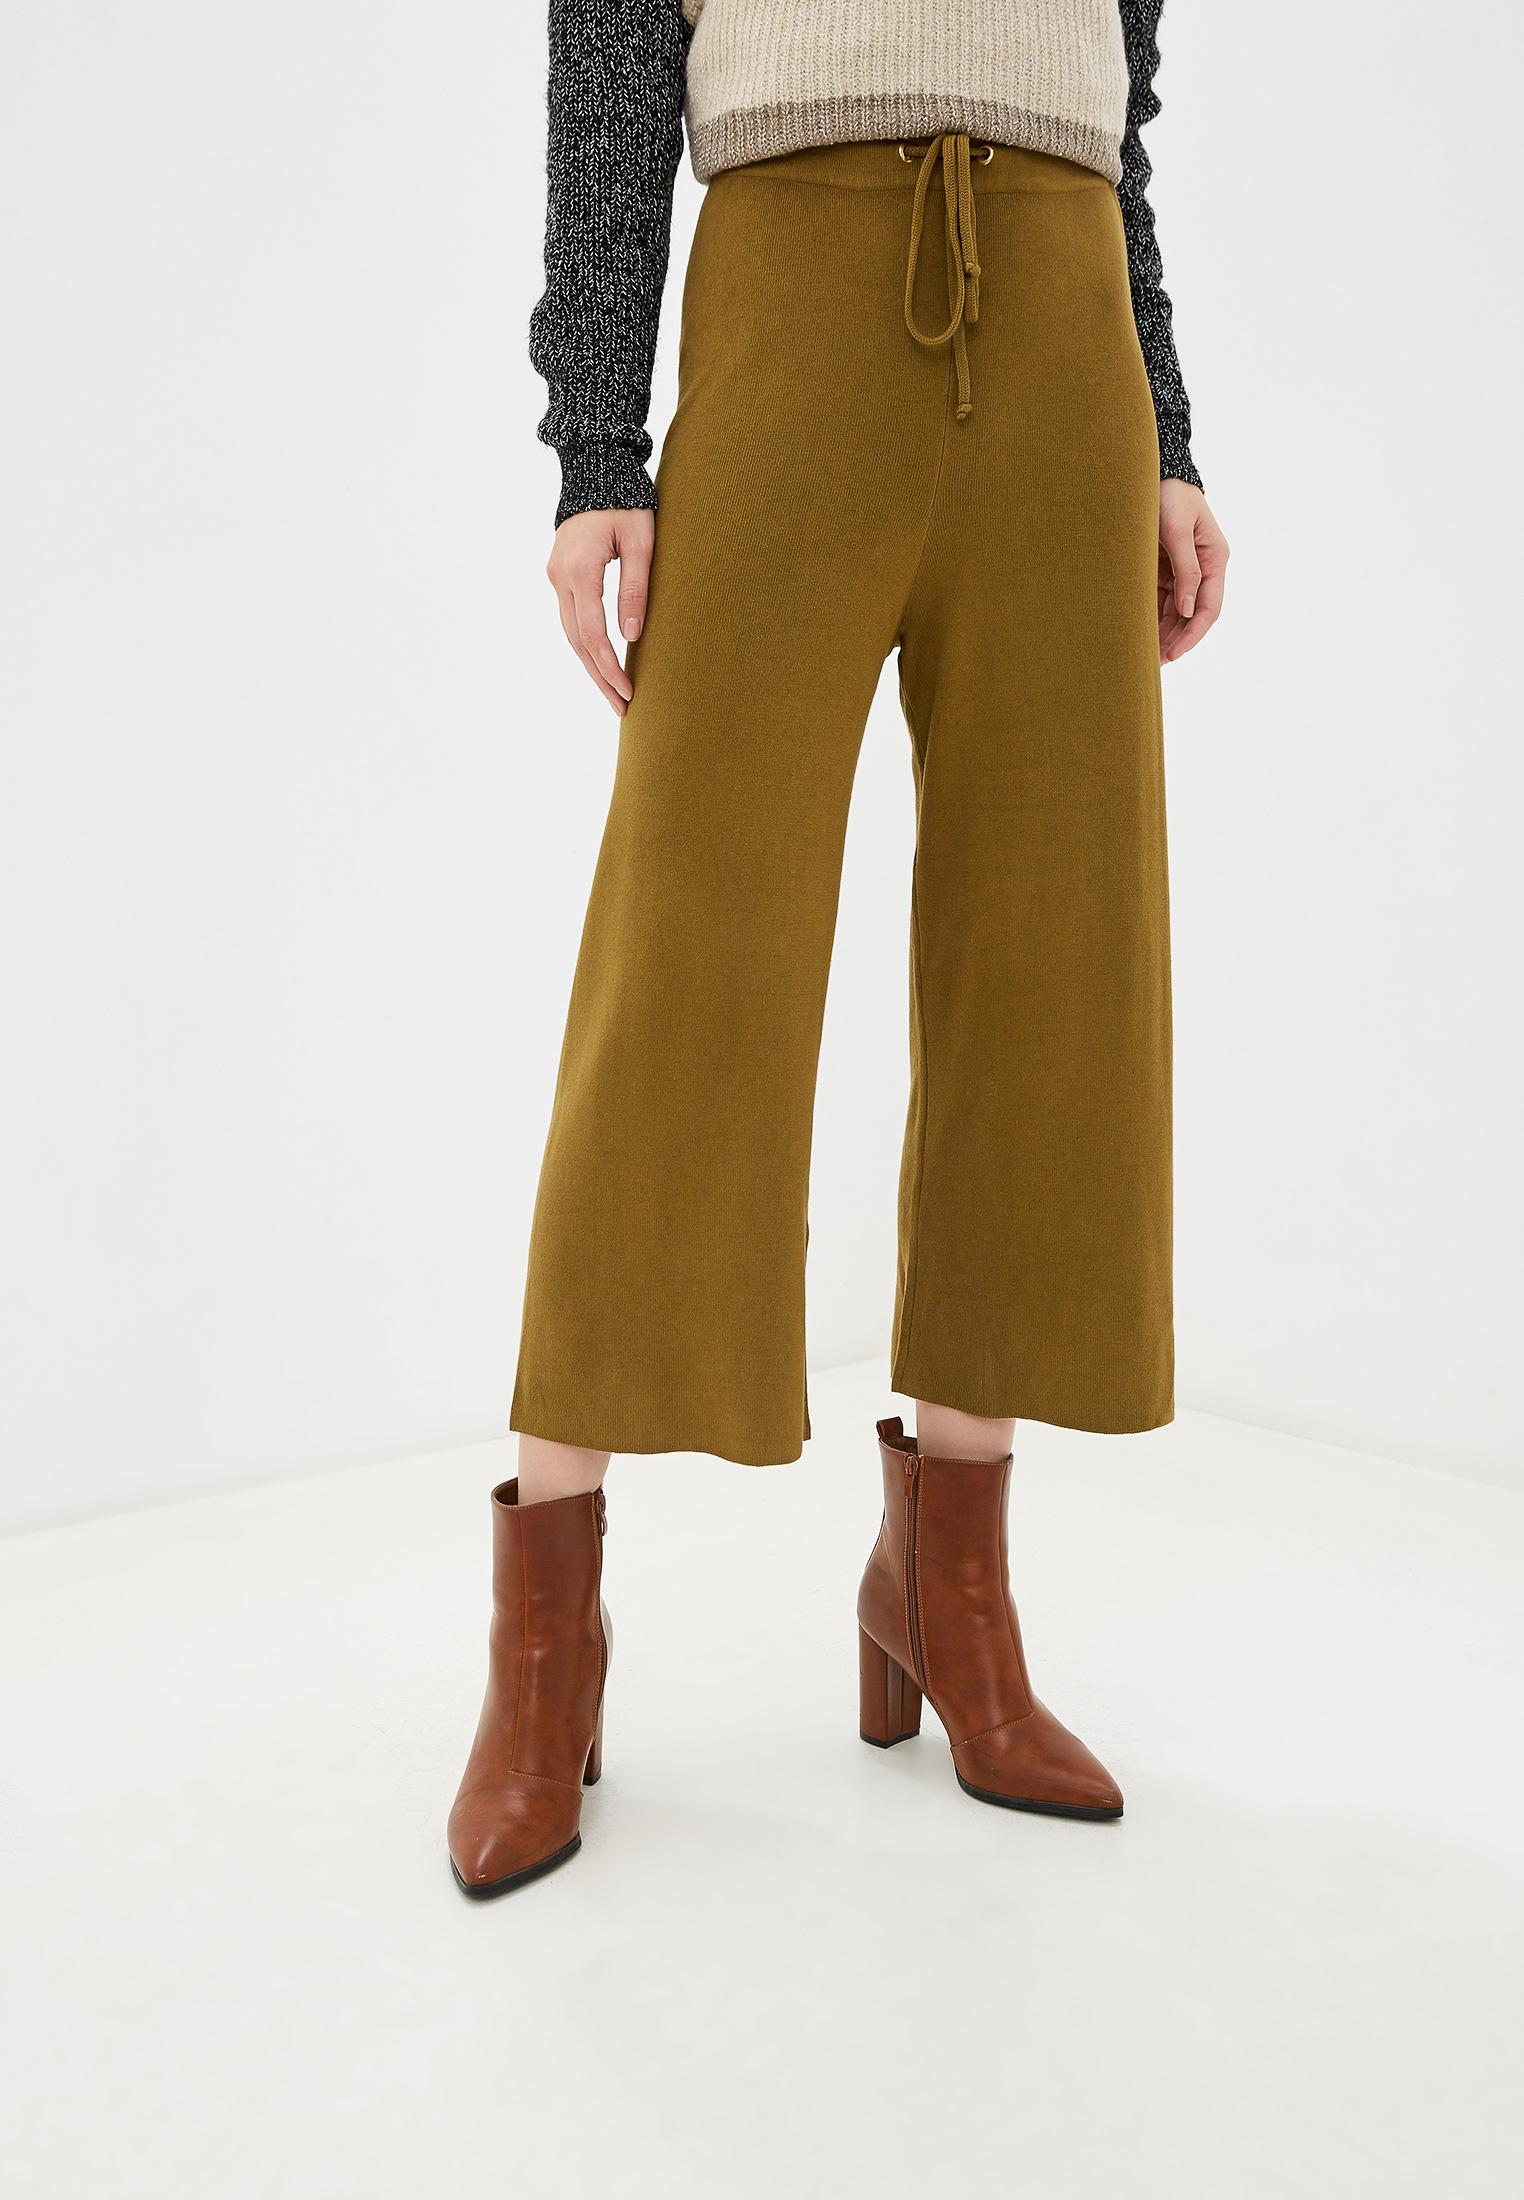 Женские широкие и расклешенные брюки Piazza Italia (Пиазза Италия) 11605